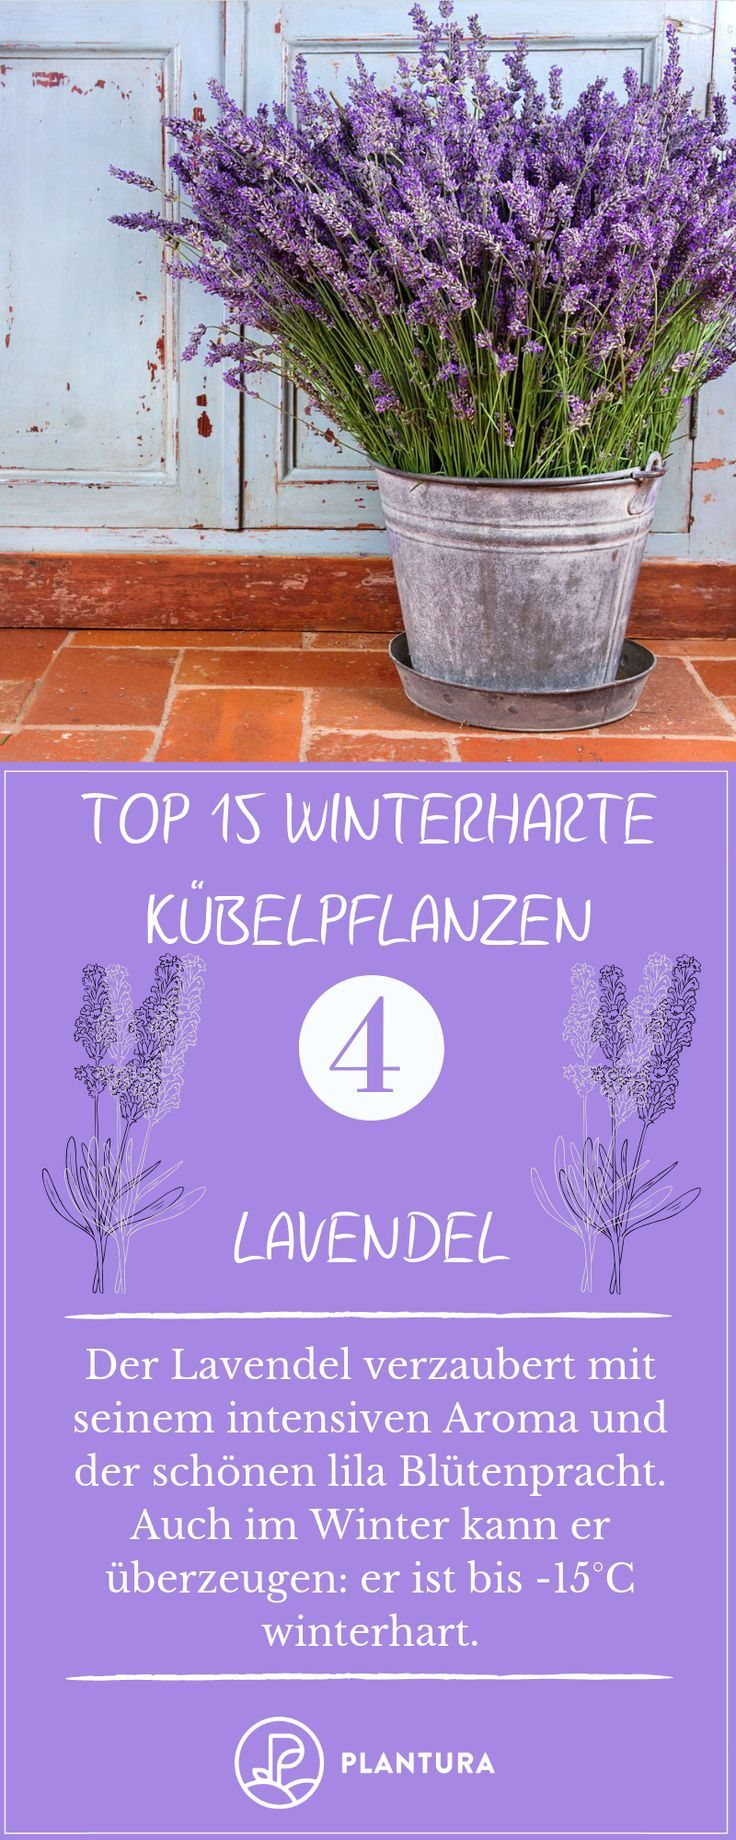 Winterharte Kübelpflanzen: Unsere Top 15 – #Kübelpflanzen #paletten #Top #Unse…